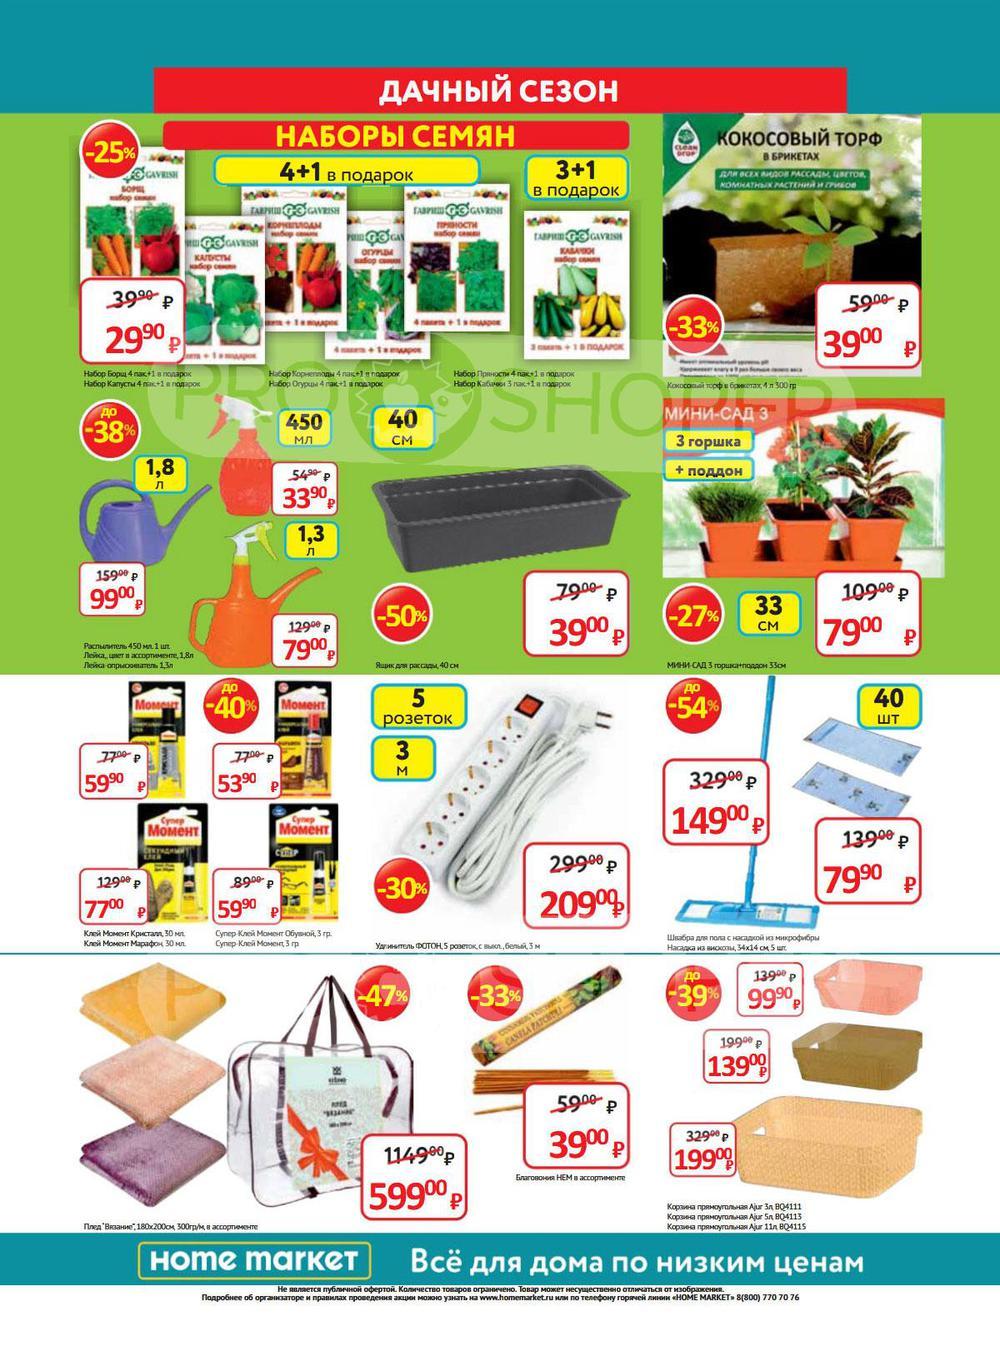 Каталог (11 - 24 Апреля 2019) от супермаркетов Лента гипермаркет в городе Орле.